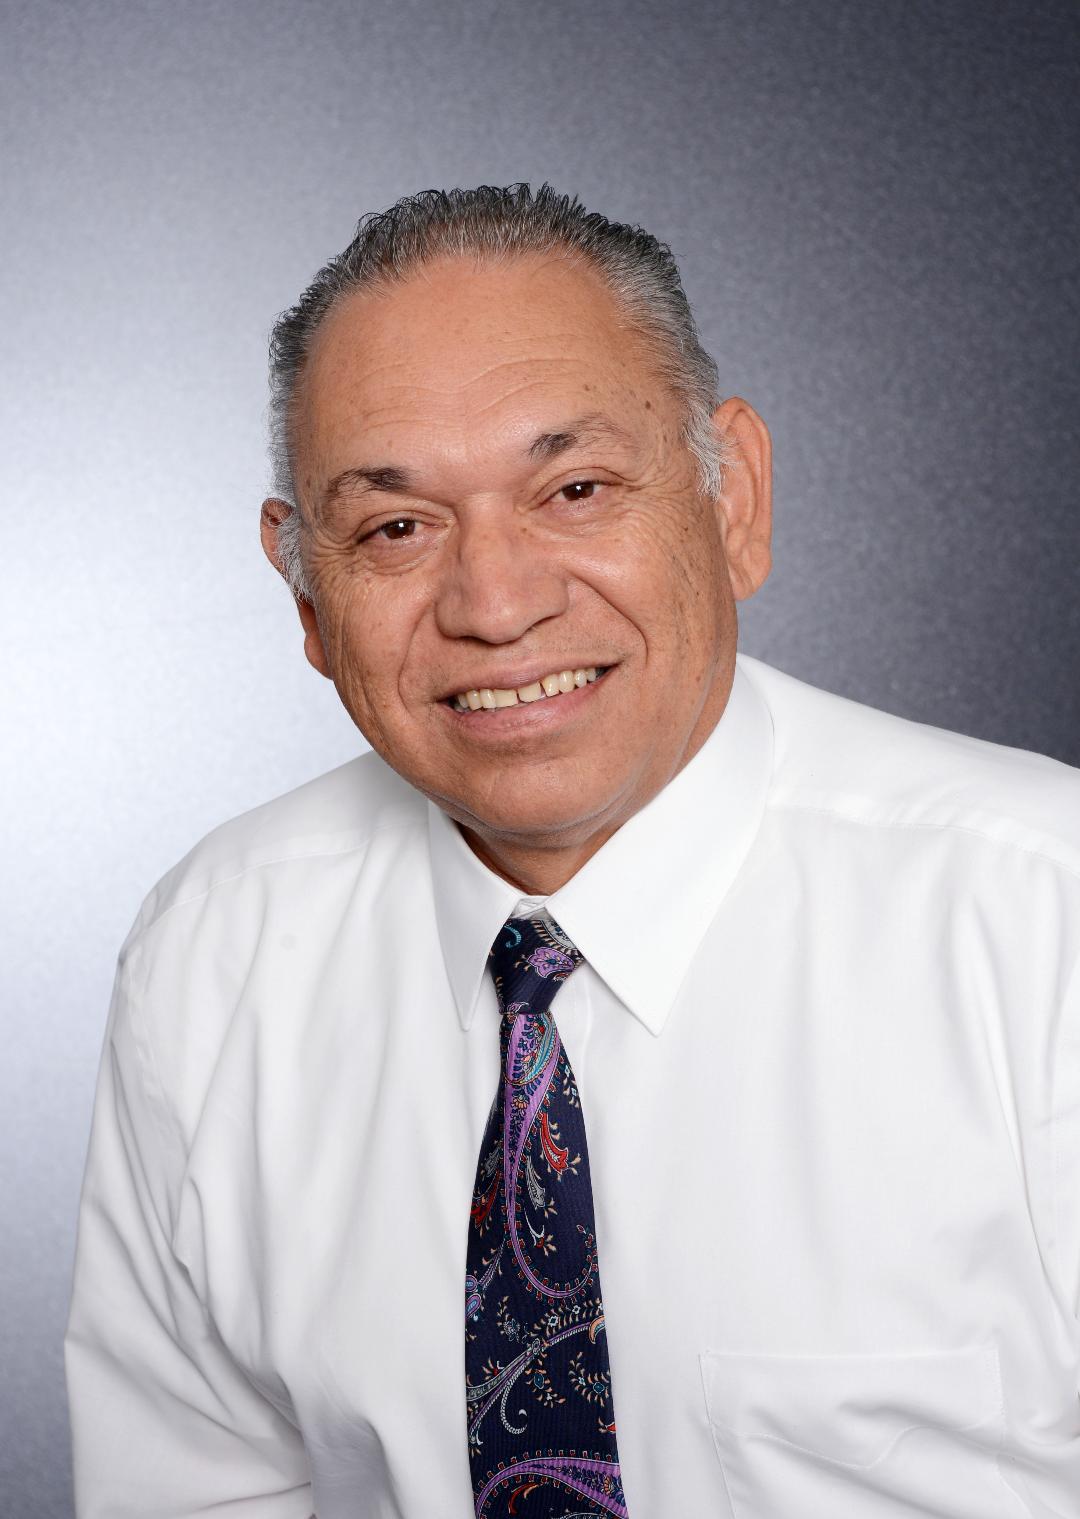 Jose Godoy